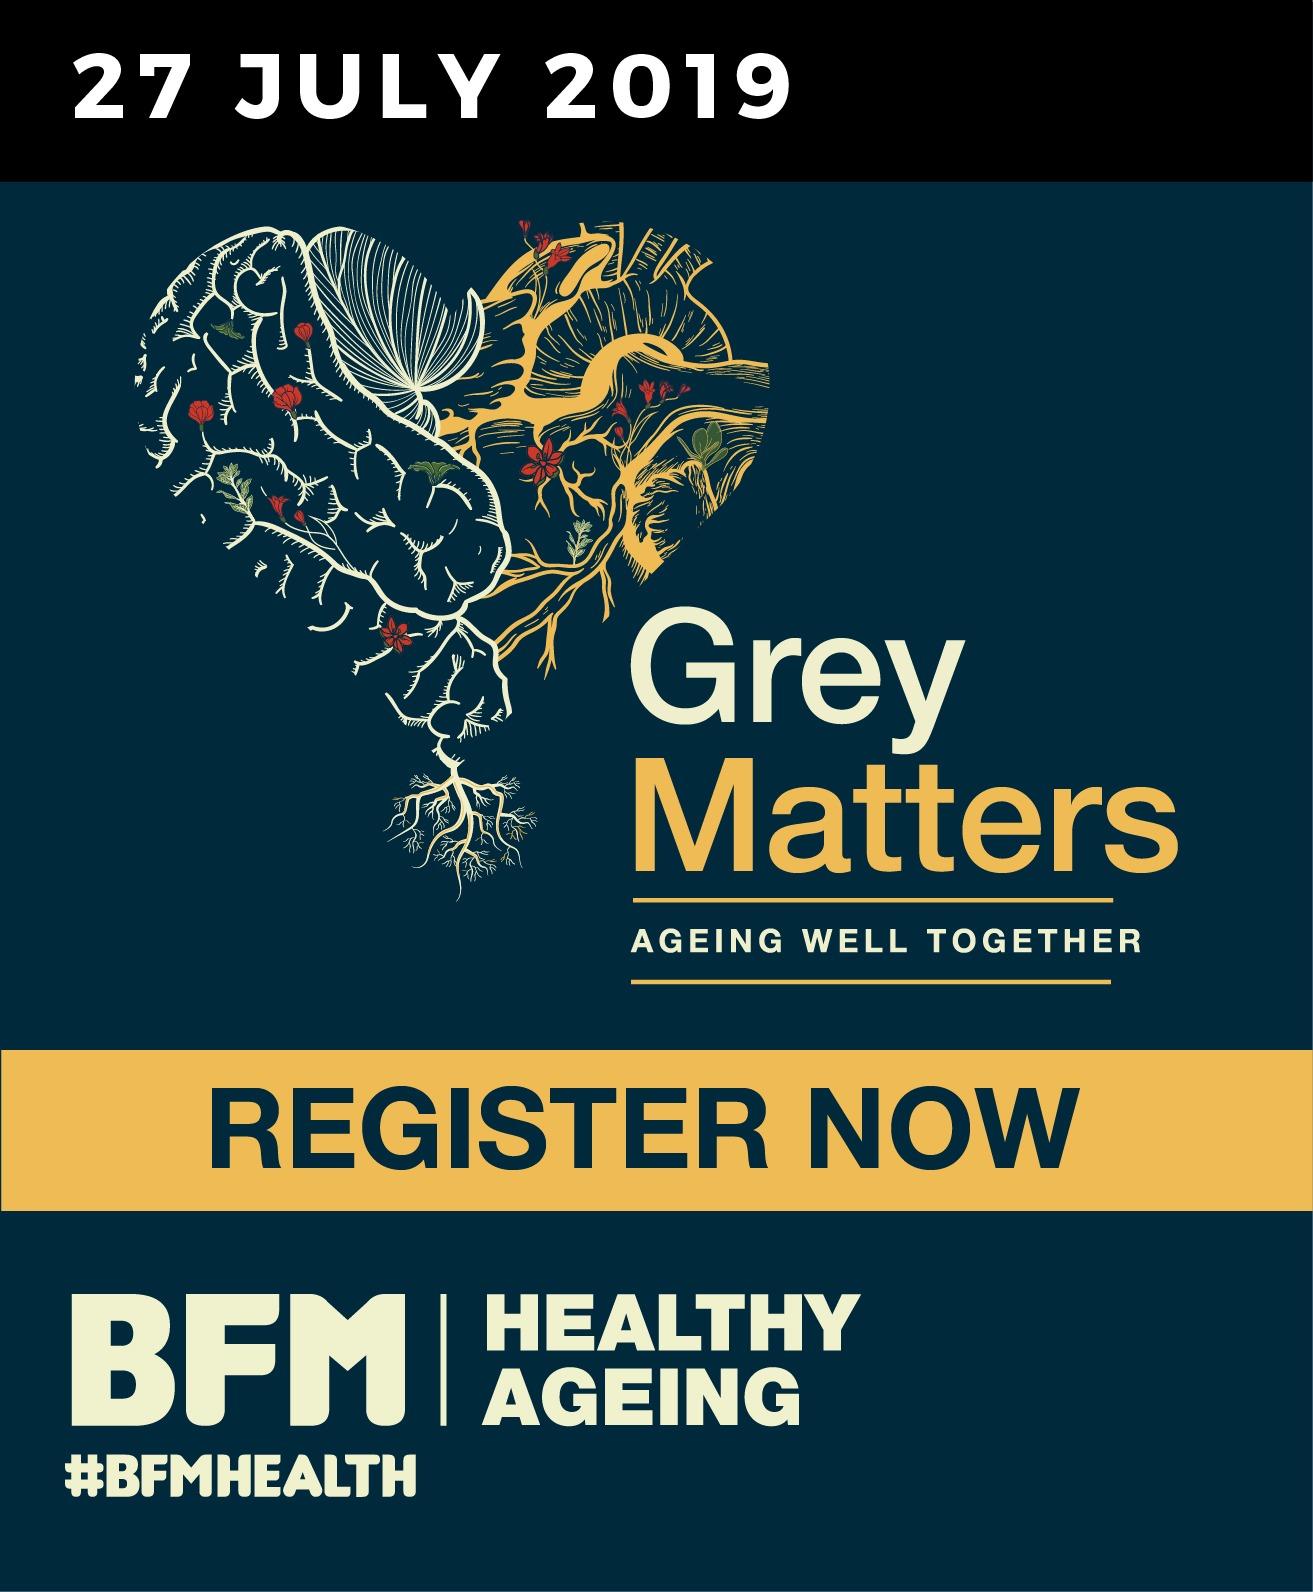 BFM Healthy Ageing 2019